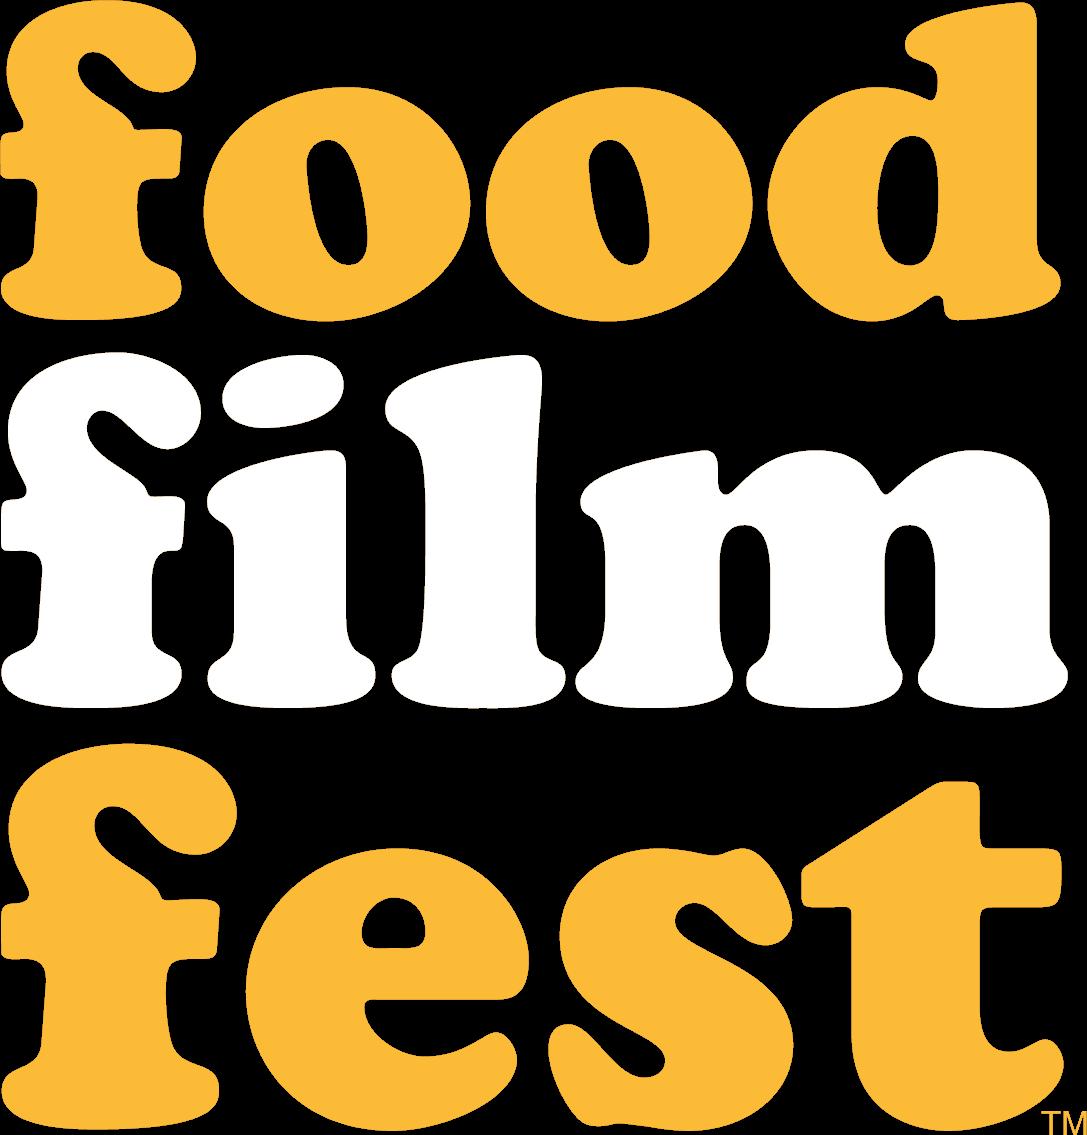 The food film festival. Volunteering clipart theatre